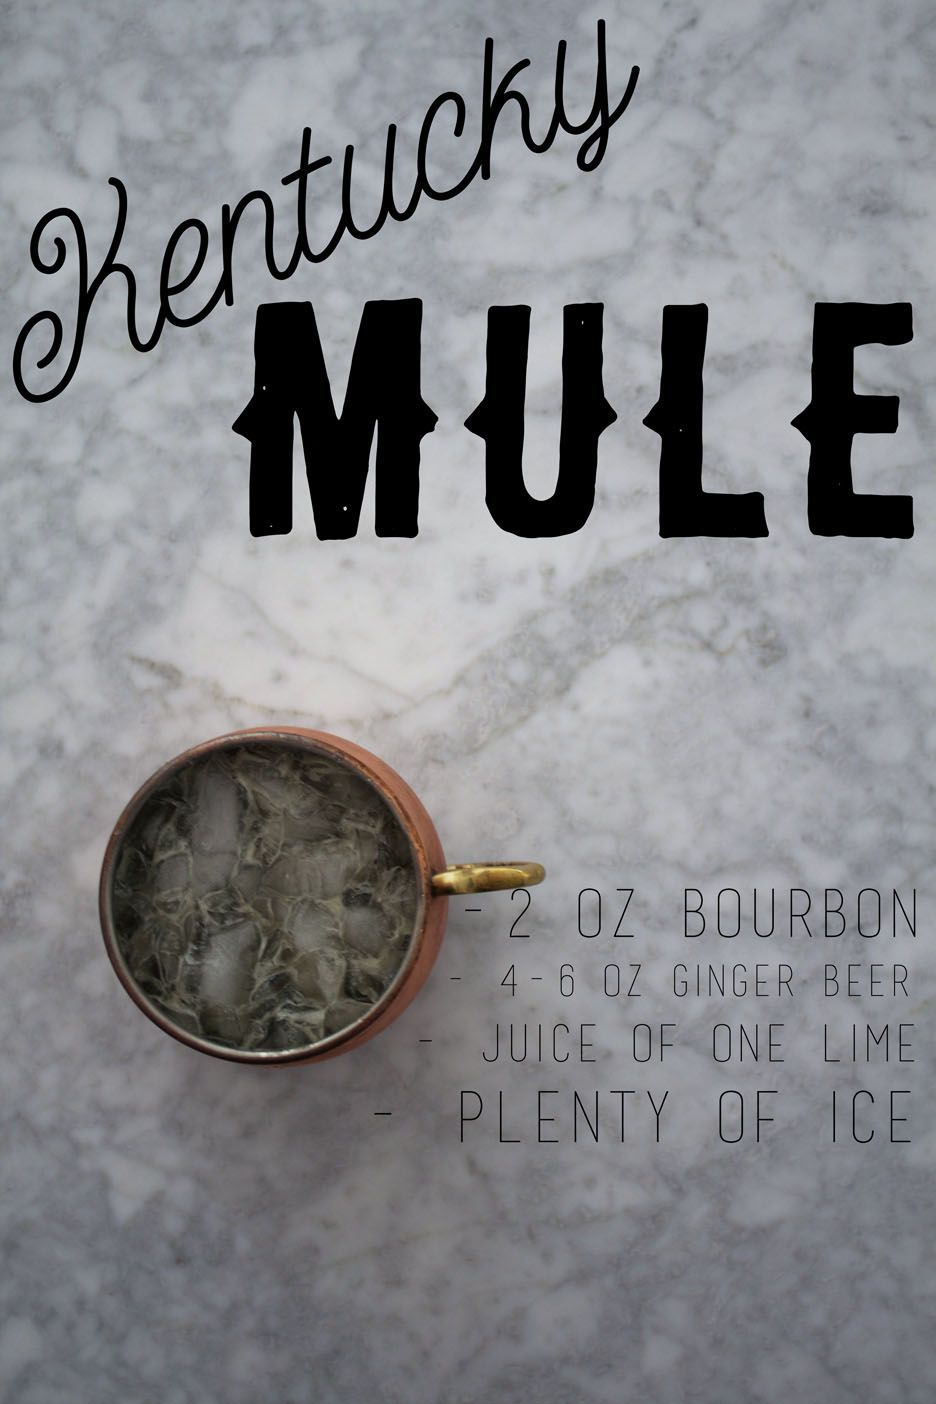 Retro vintage style metal tin sign gift Home Decor Pub Montana Mule